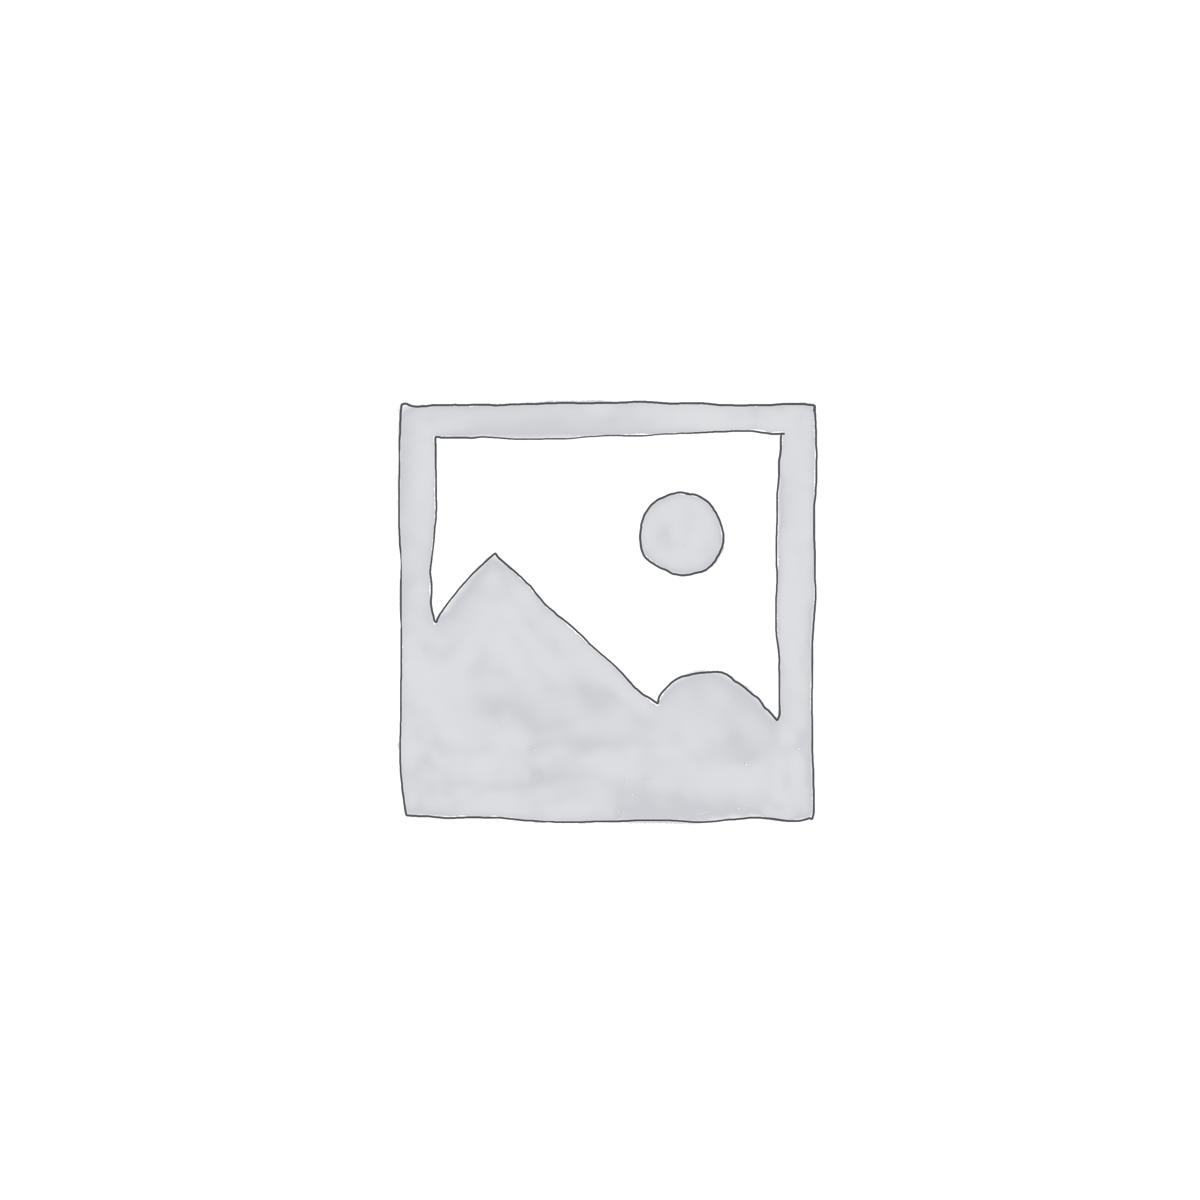 Декоративная решетка (<b>ольха</b>), размеры 60х150 см